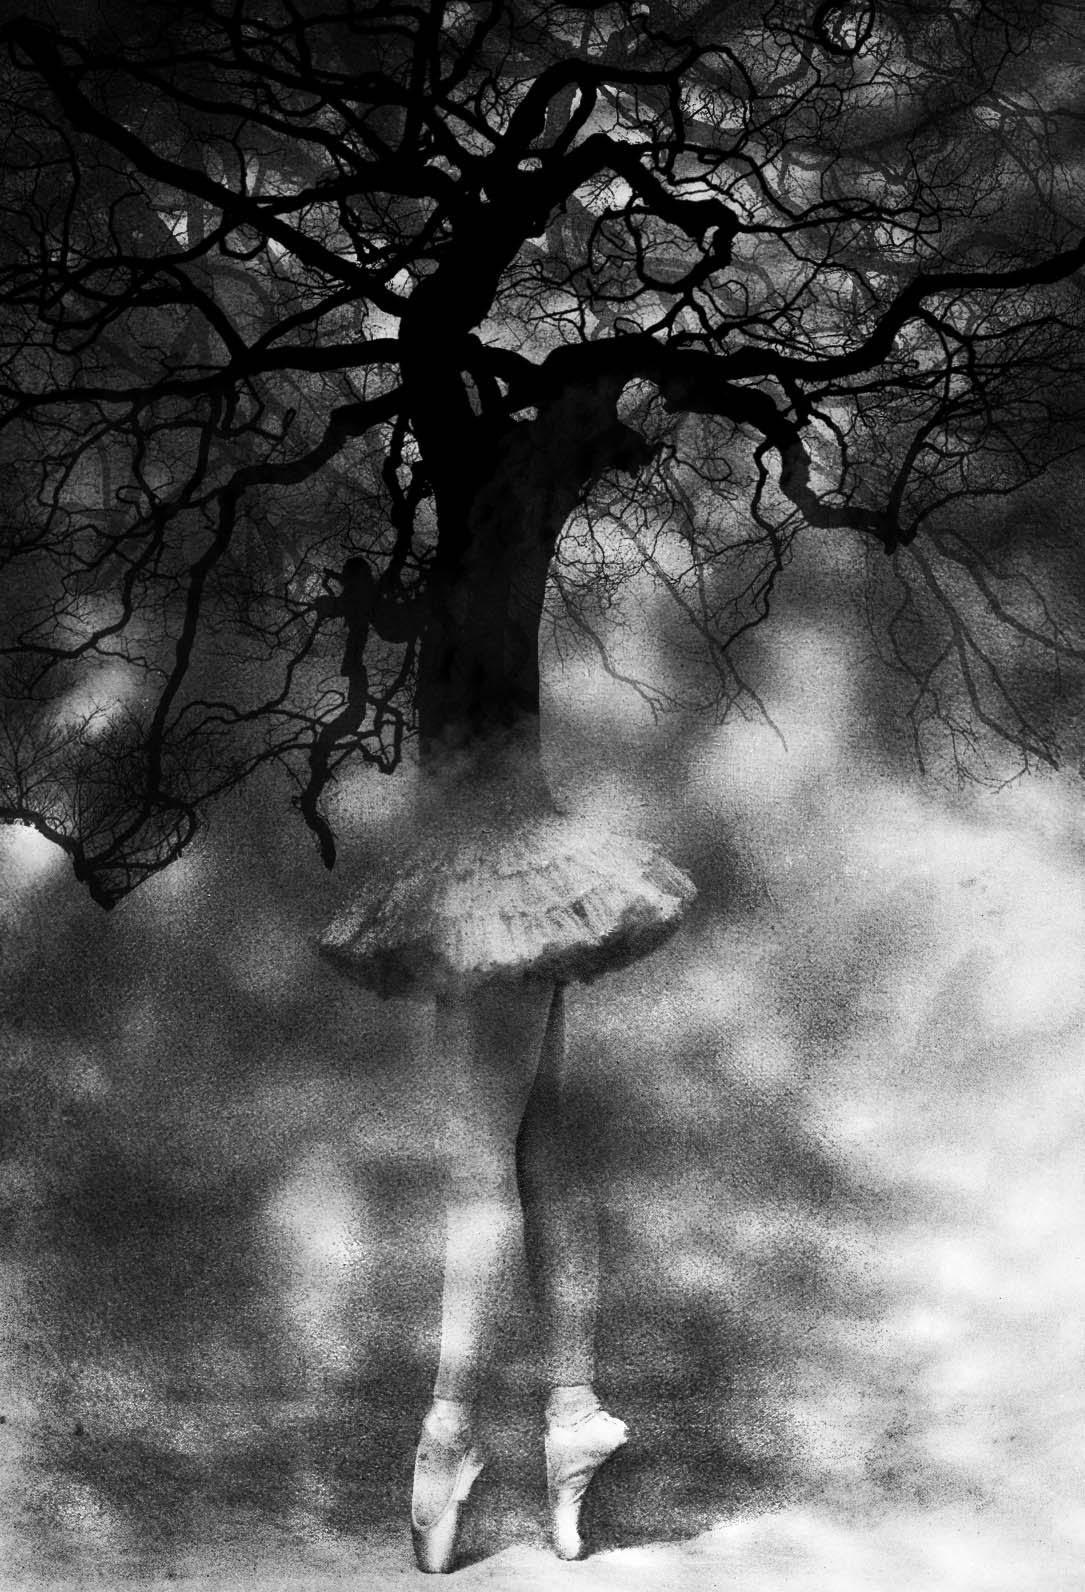 When trees dream